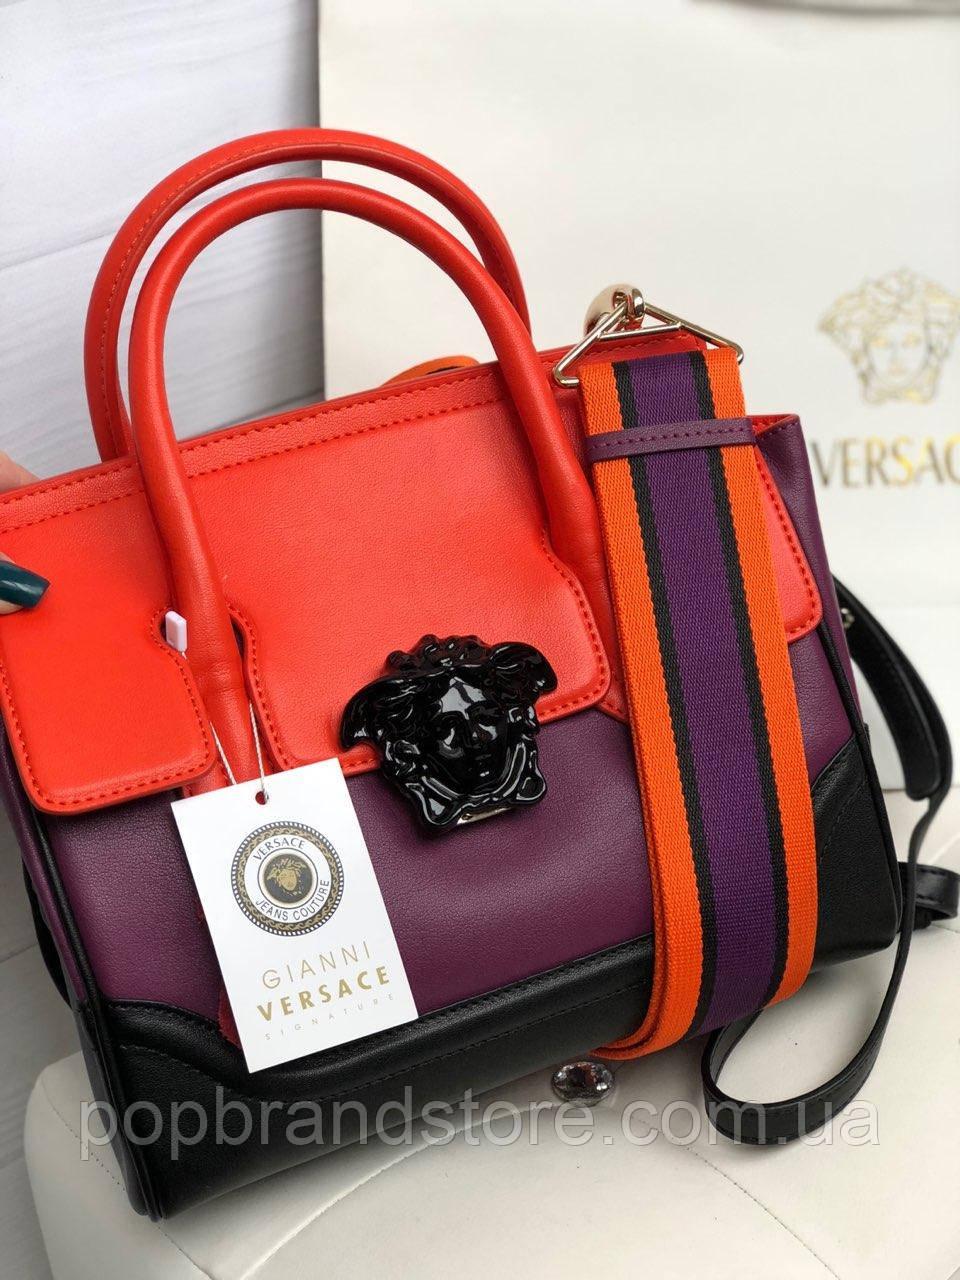 933e0aafcc89 Стильная женская сумка VERSACE Palazzo Empire (реплика) - Pop Brand Store |  брендовые сумки